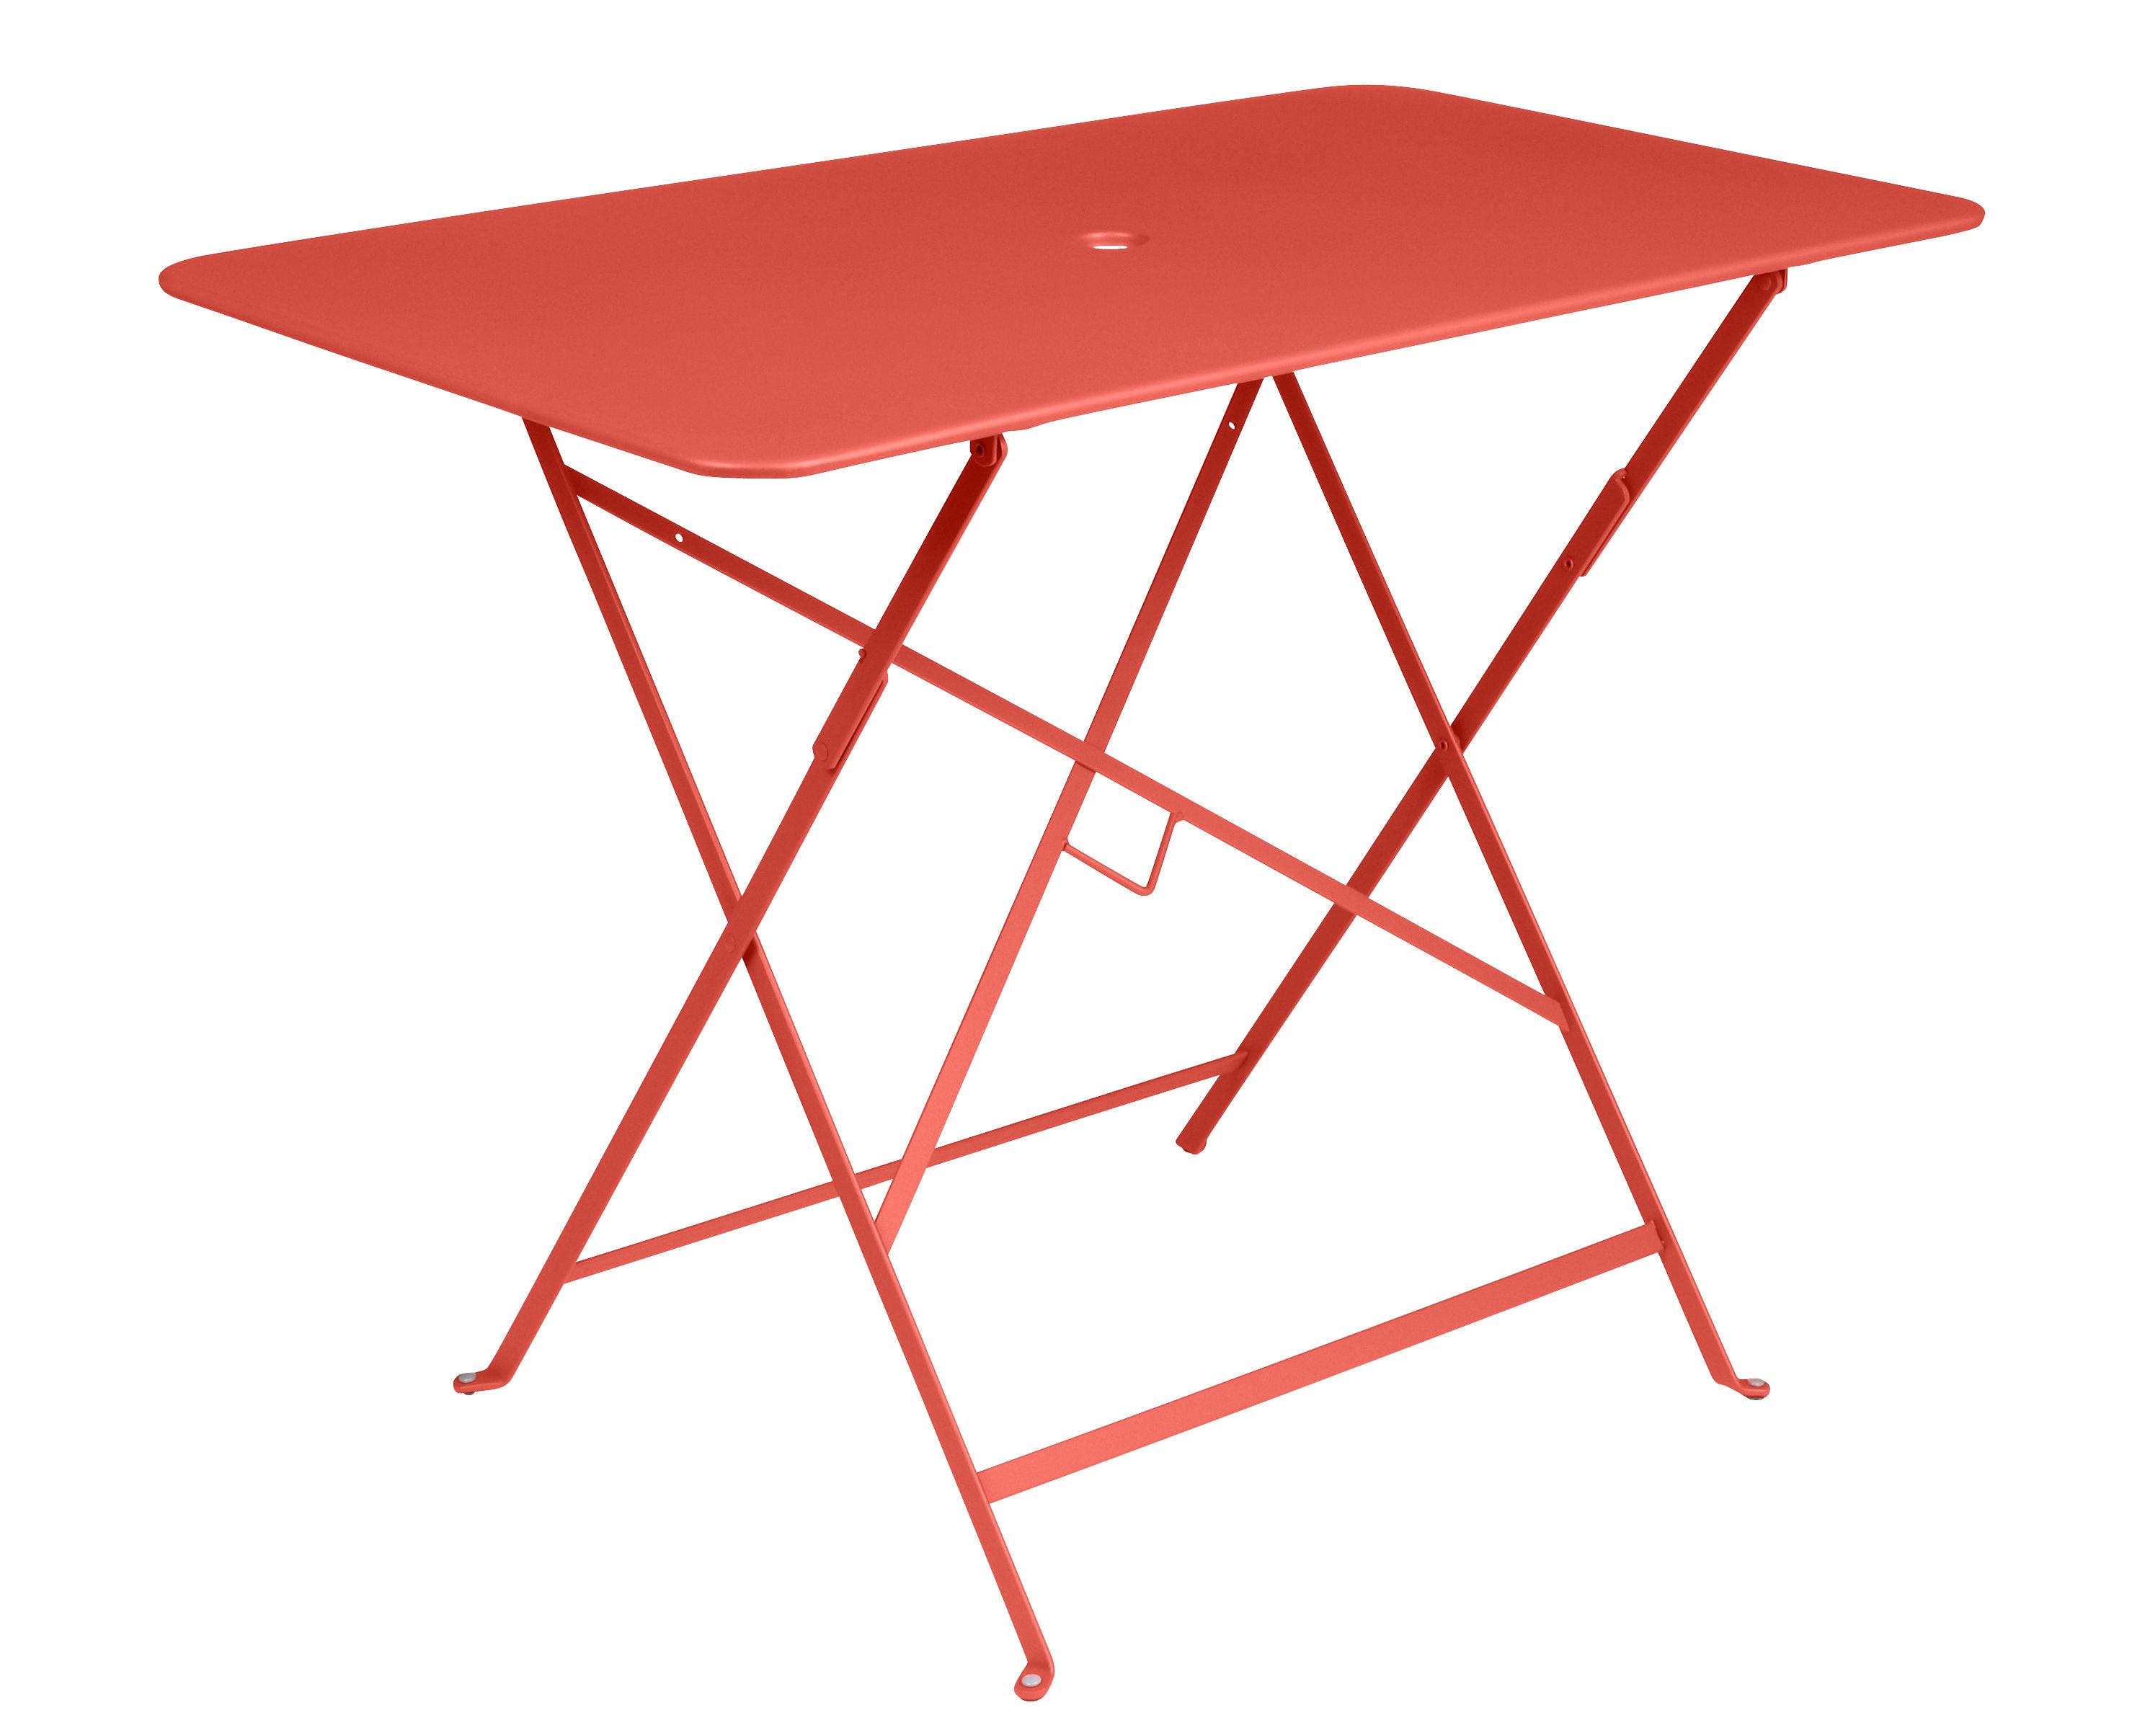 Outdoor - Tables de jardin - Table pliante Bistro / 97 x 57 cm - 4 personnes - Trou parasol - Fermob - Capucine - Acier peint